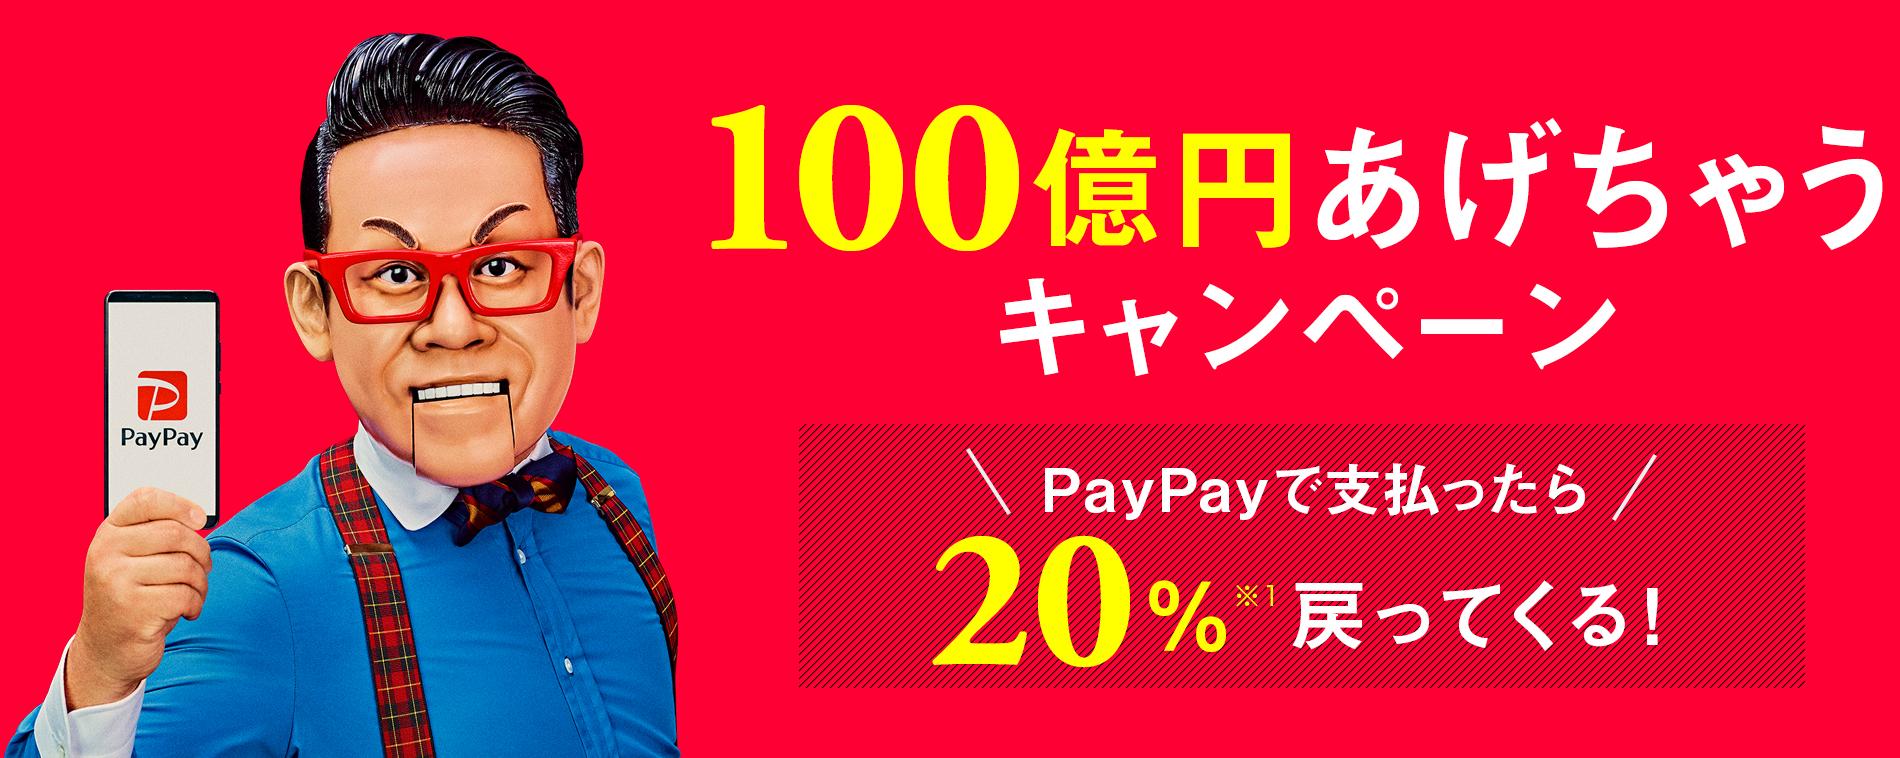 PayPay20%バックがついに終了へ。100億円が枯渇。~5/13。